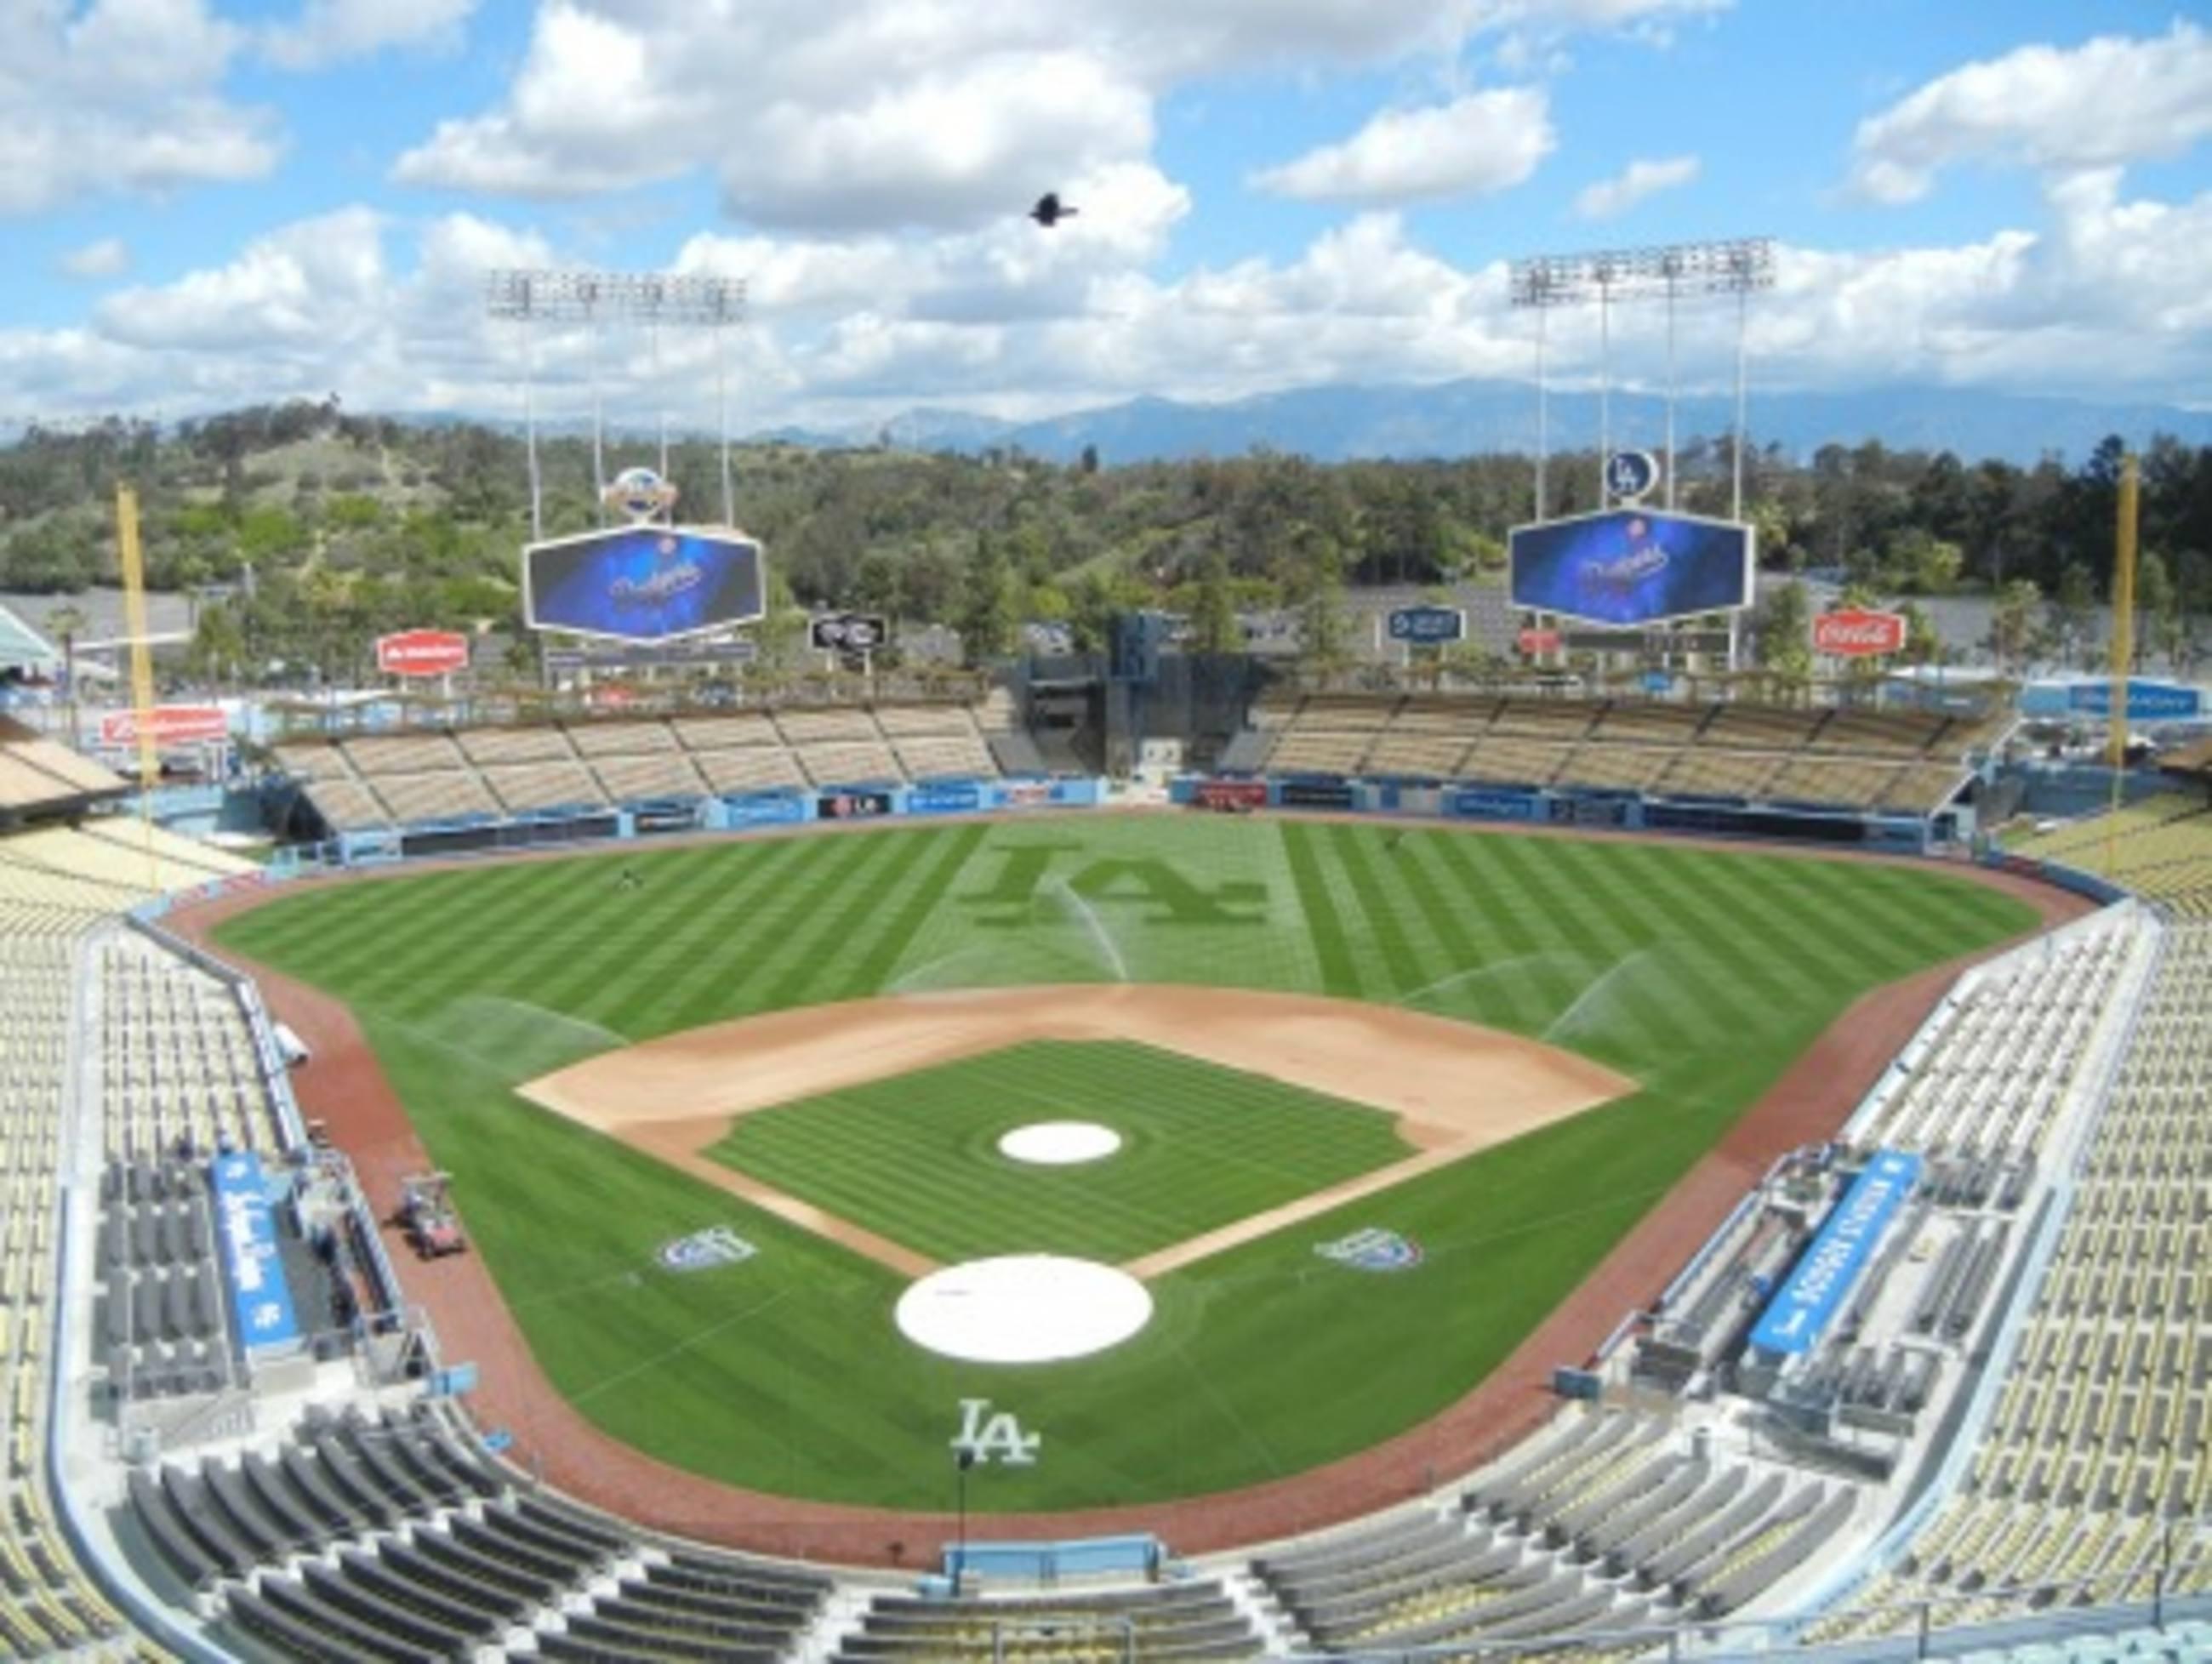 Los Angeles Dodgers / Dodger Stadium